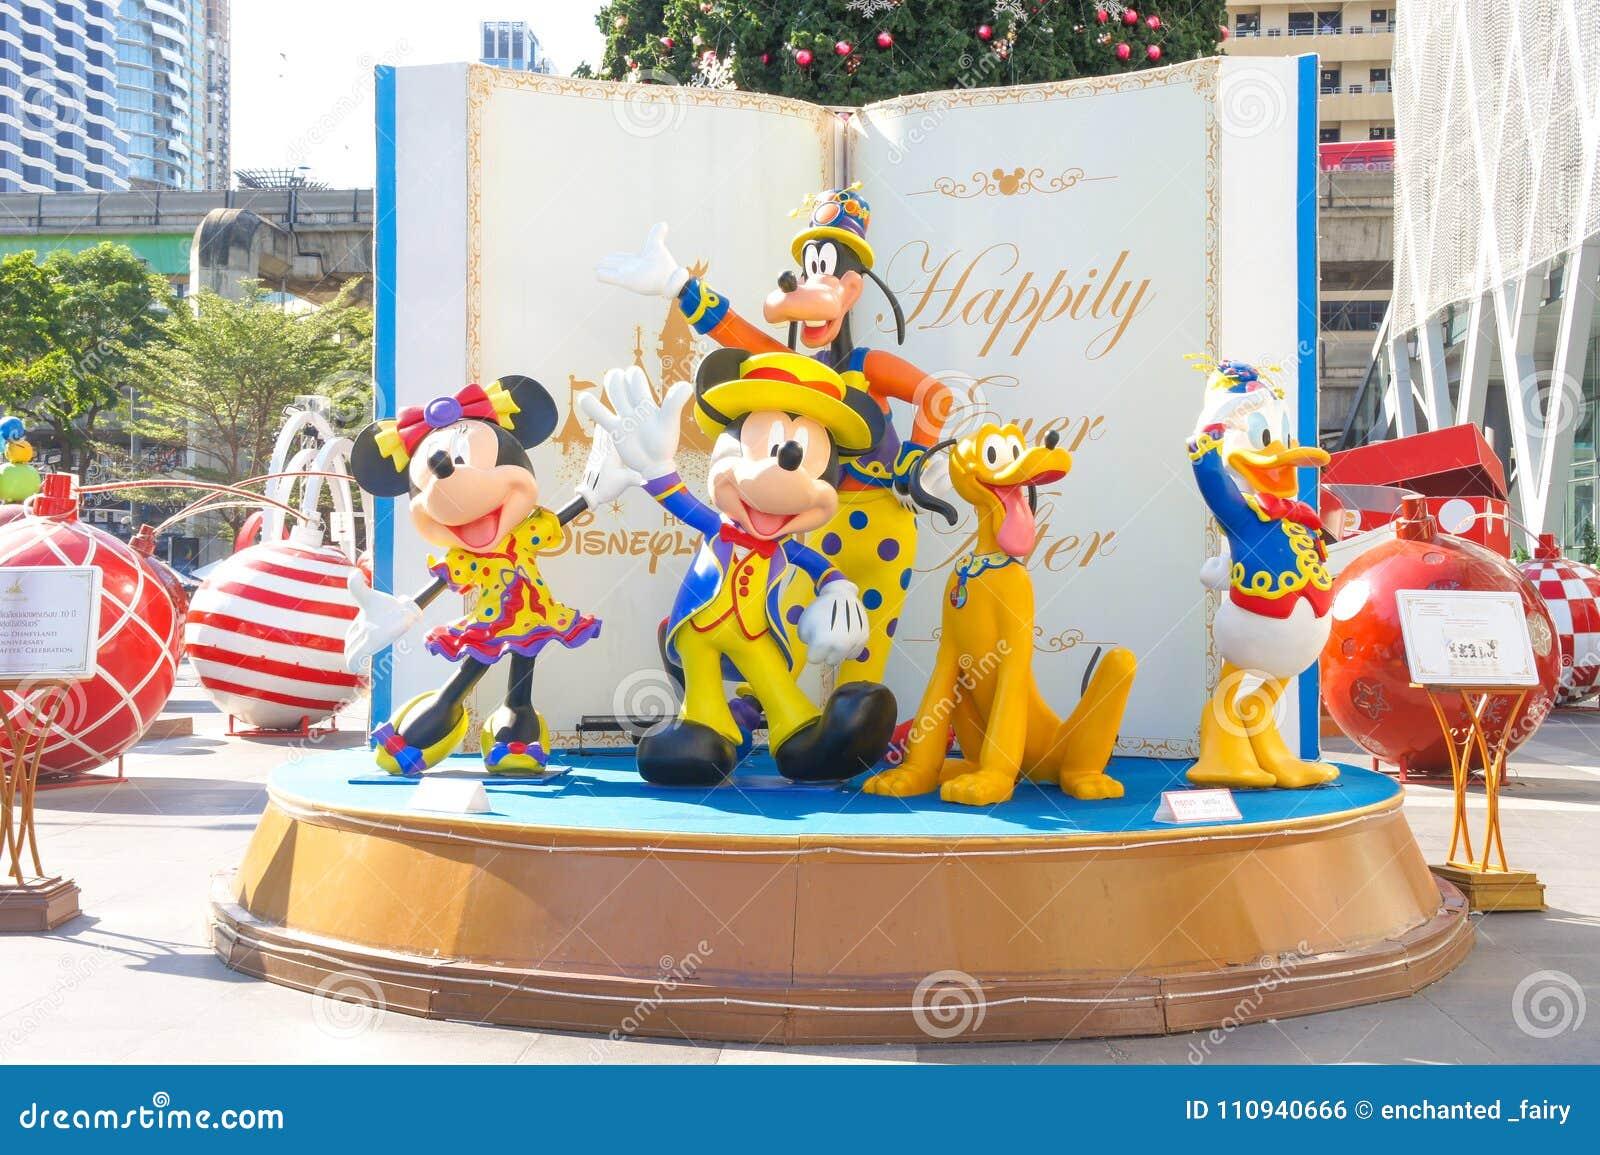 Disneyland Karaktermascottes van Mickey Mouse en vrienden